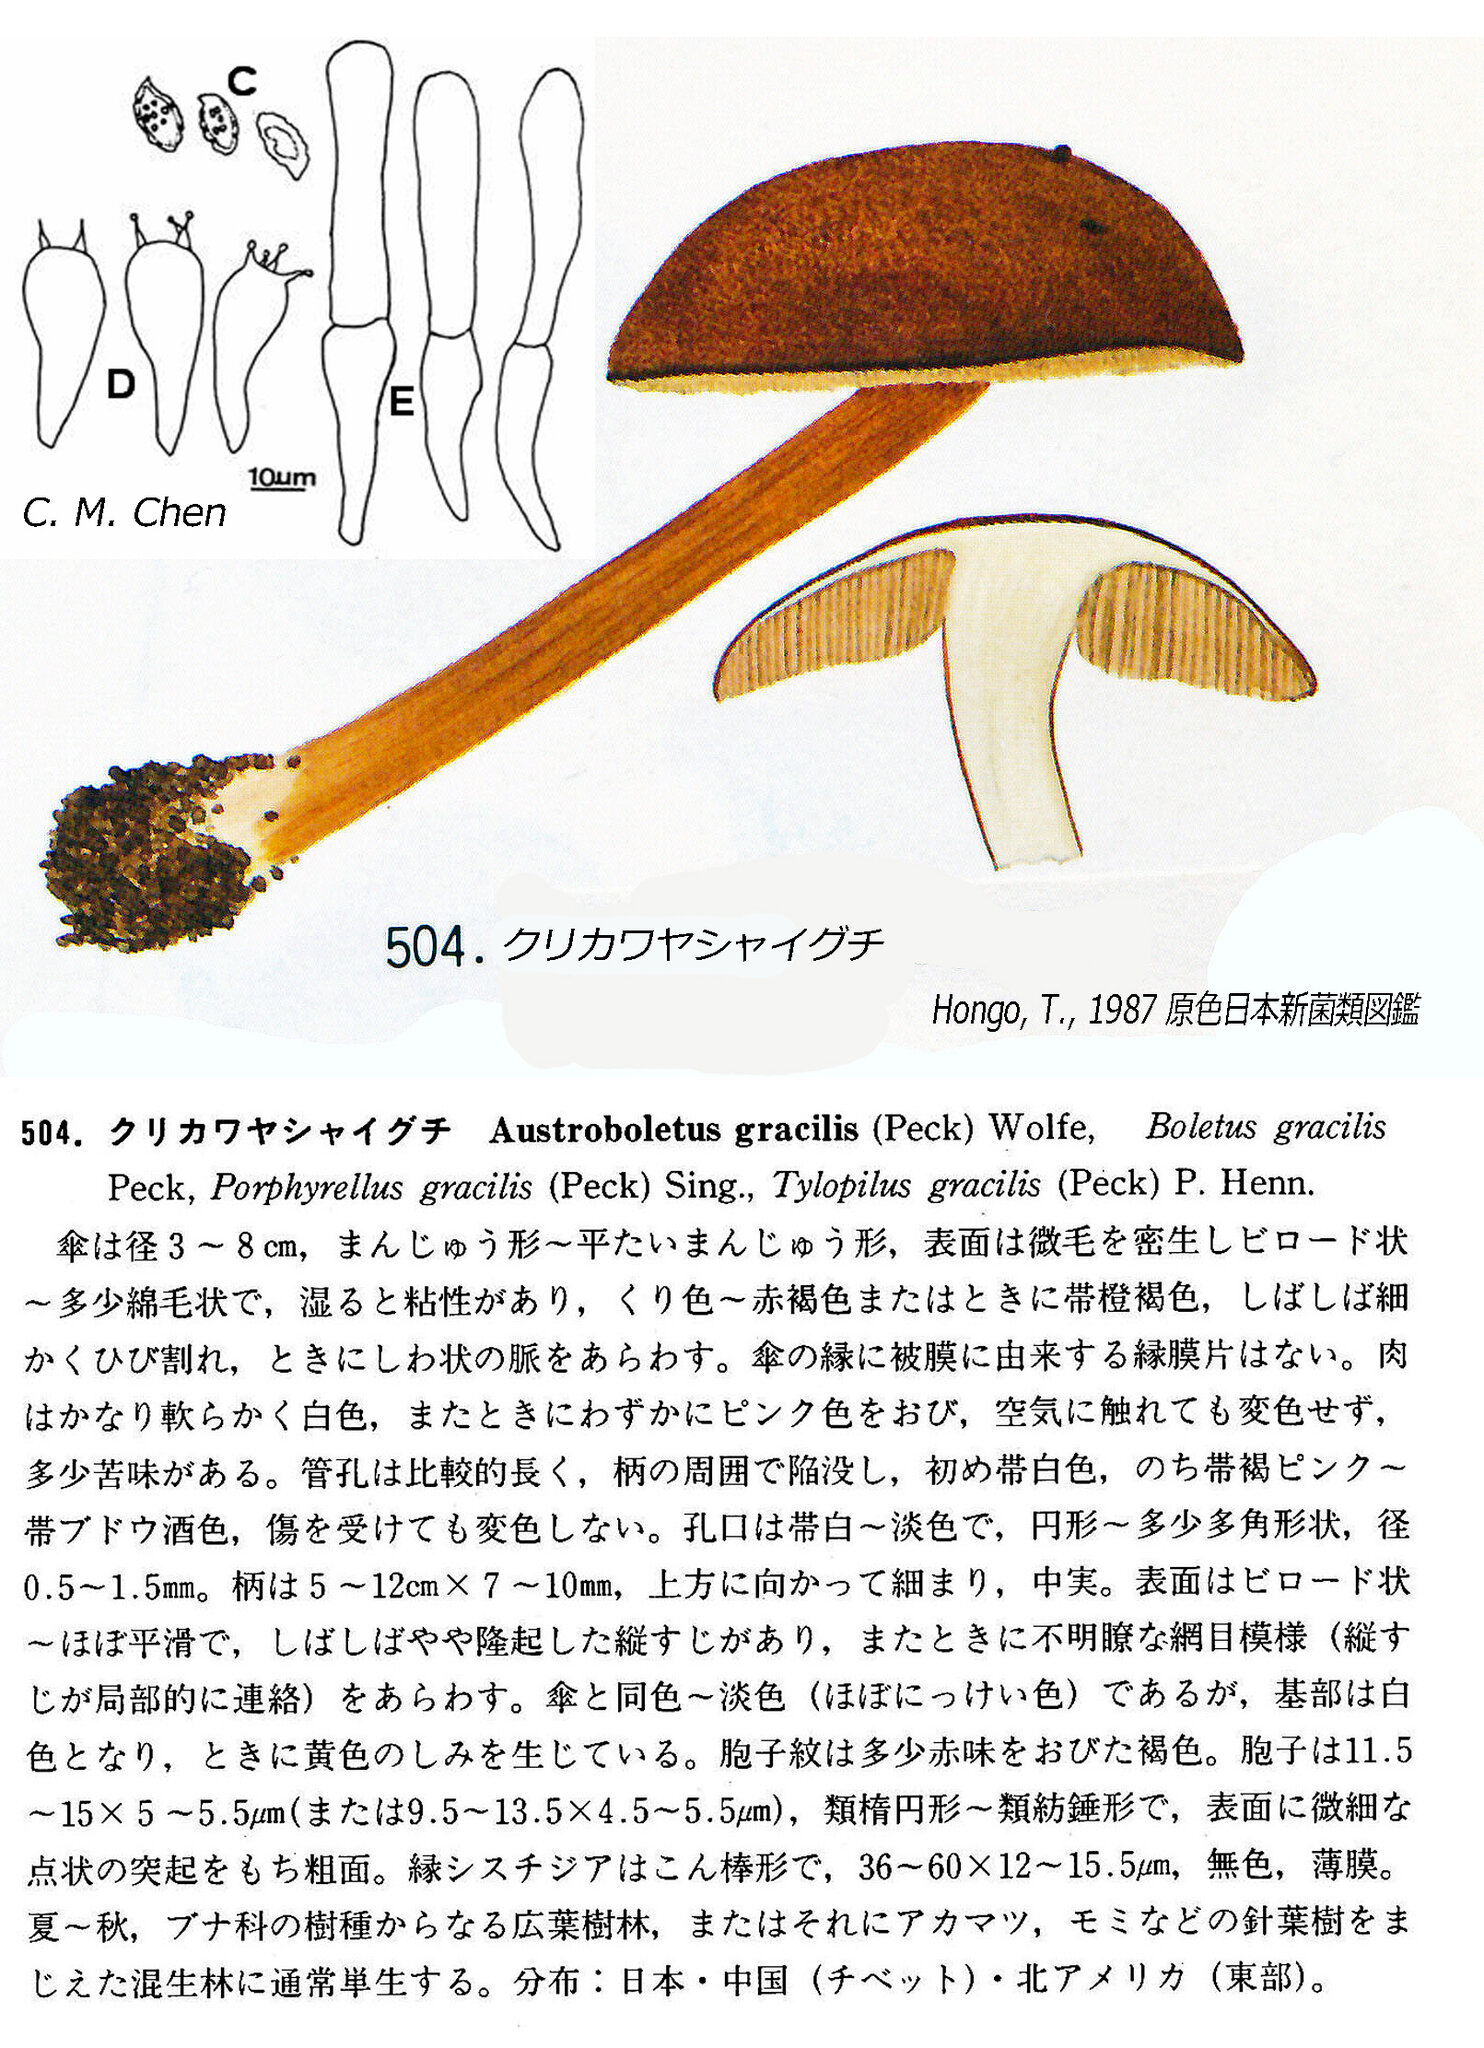 Austroboletus_gracilis_IH_pl70_504